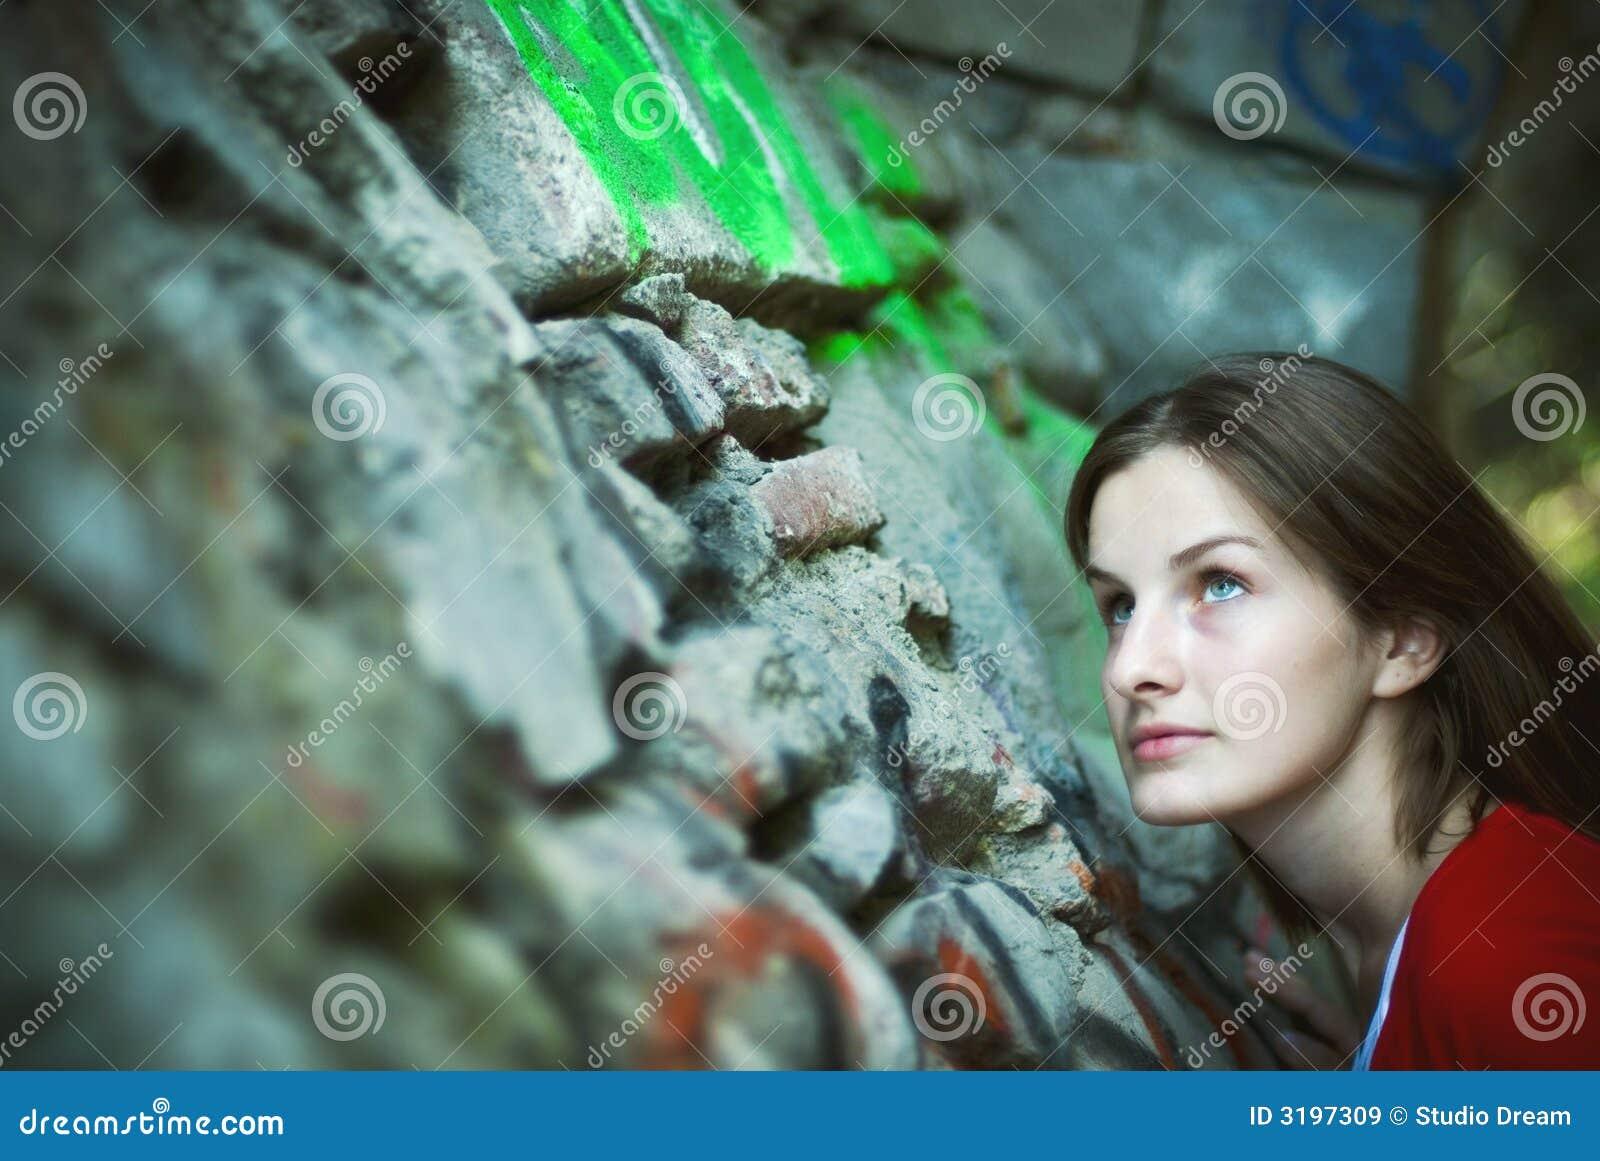 Femme recherchant le mur en pierre